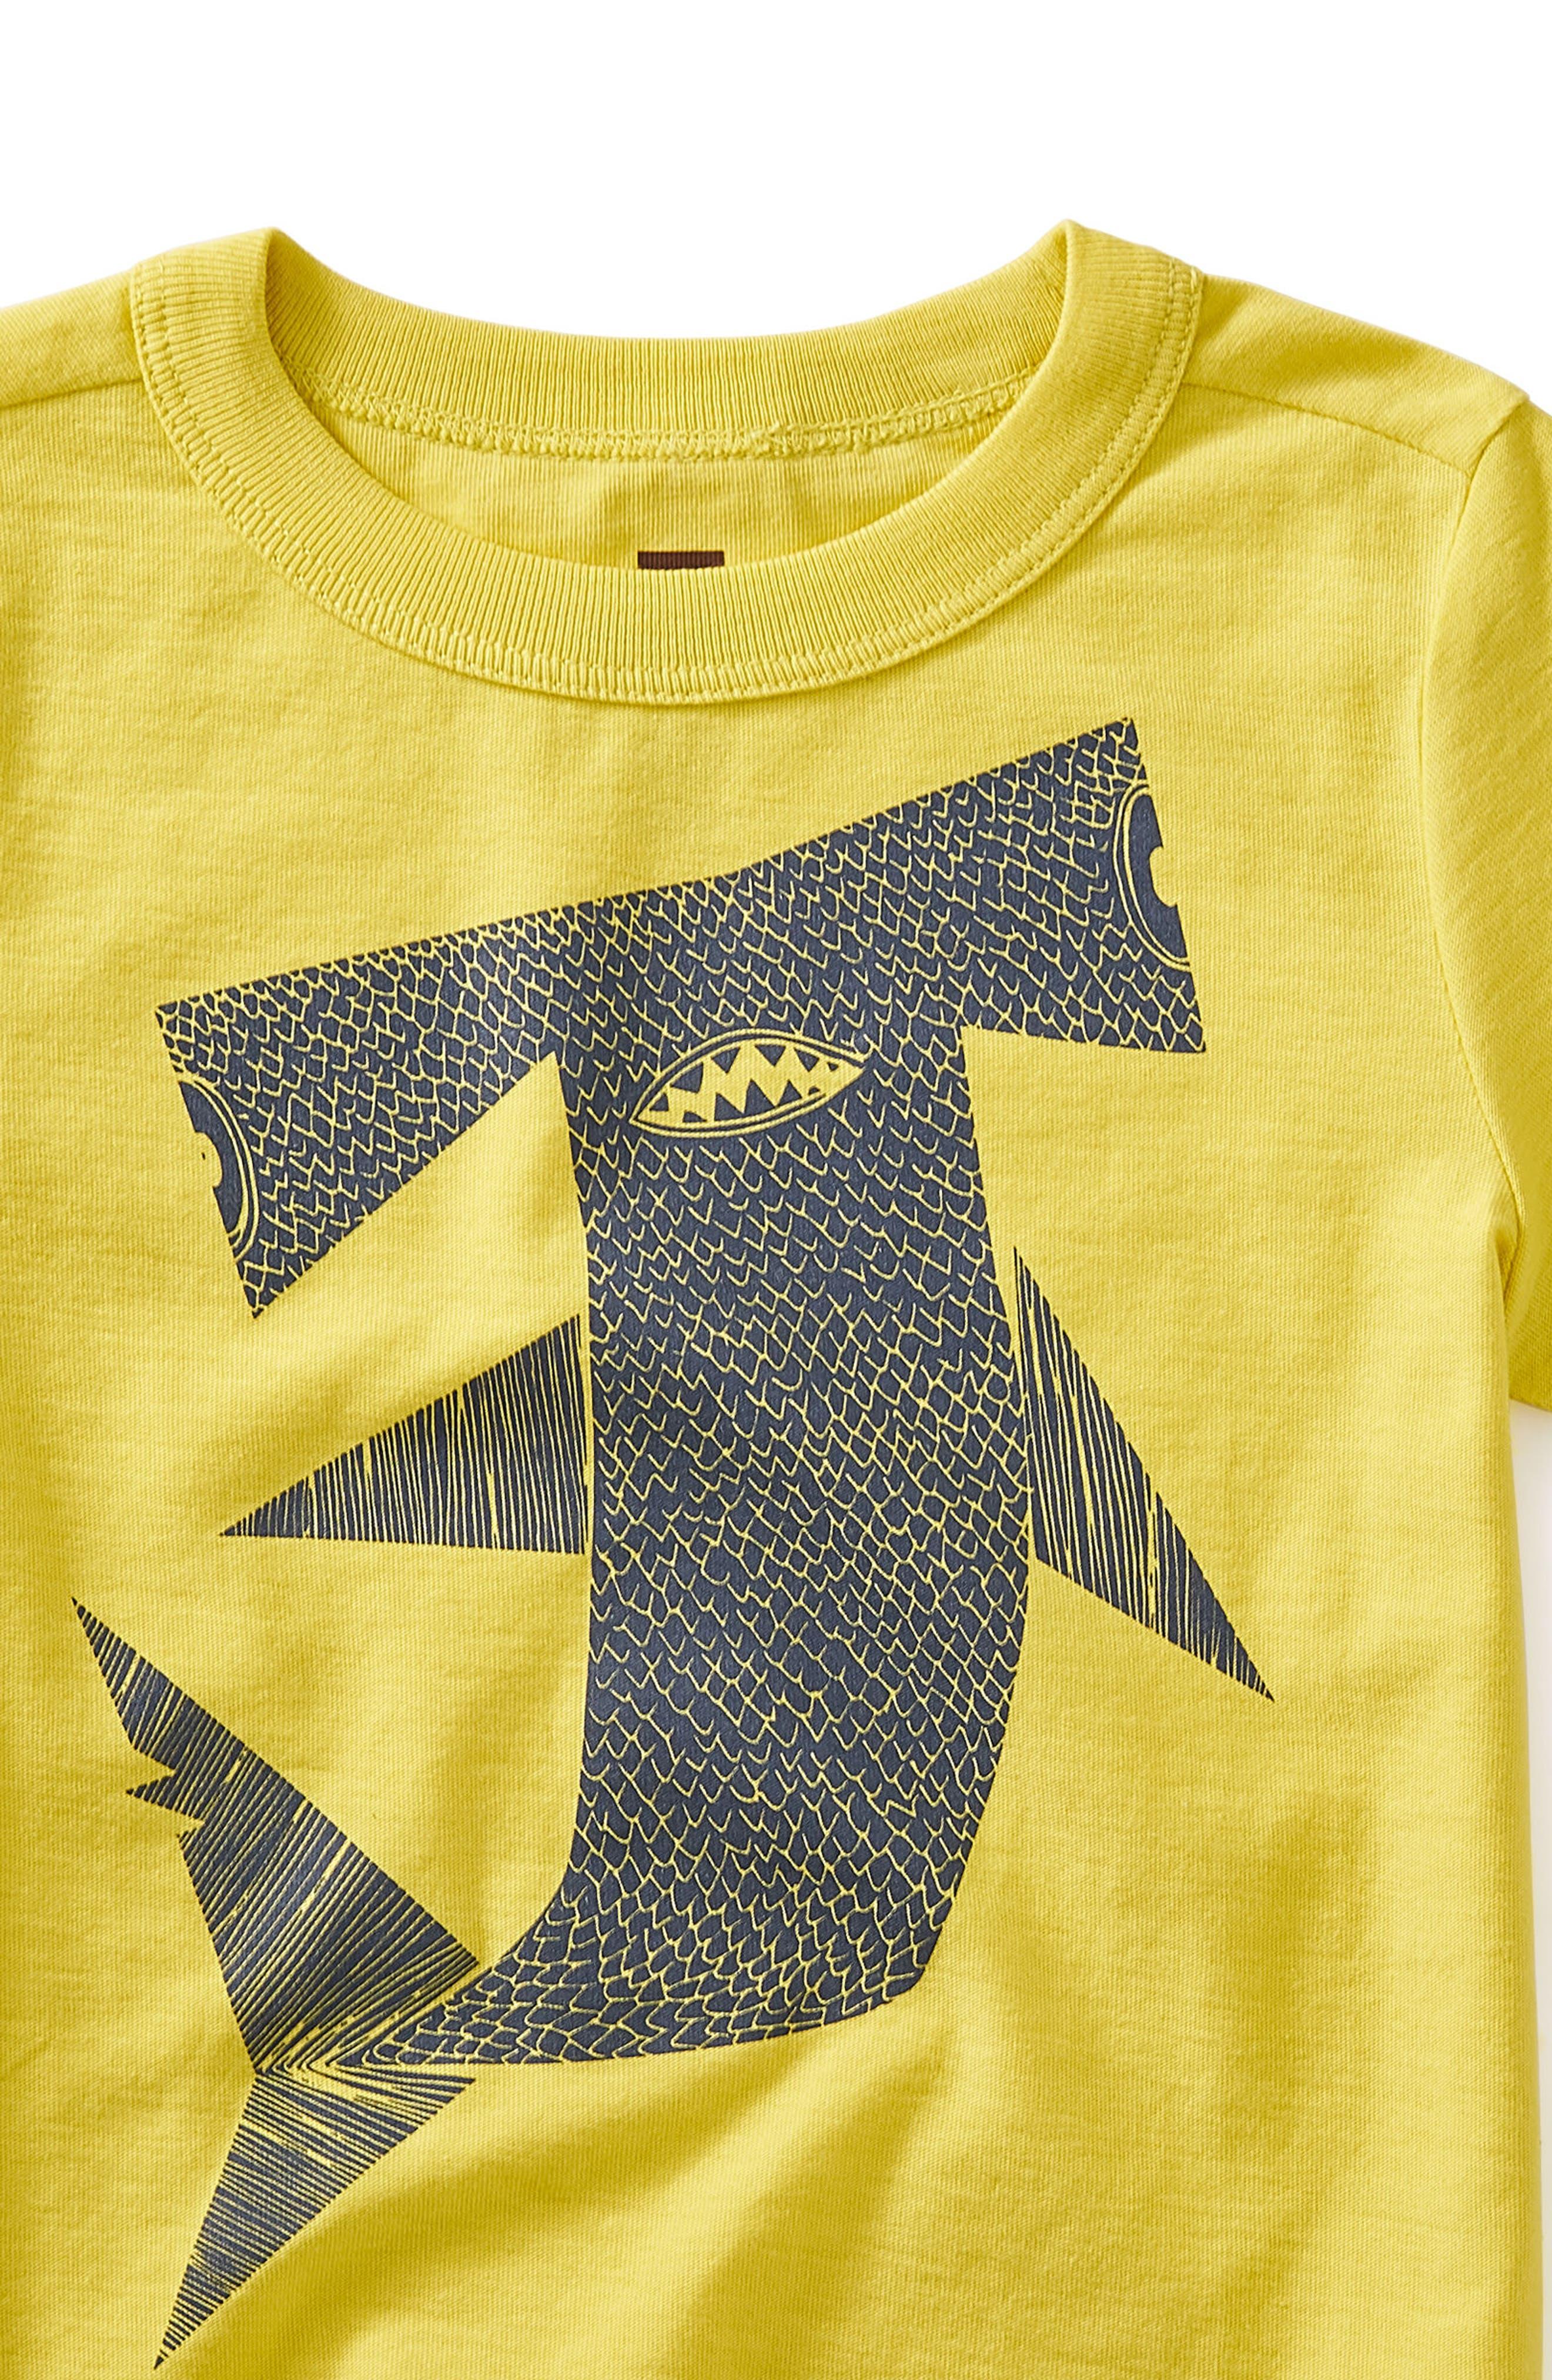 Hammer Time T-Shirt,                             Alternate thumbnail 2, color,